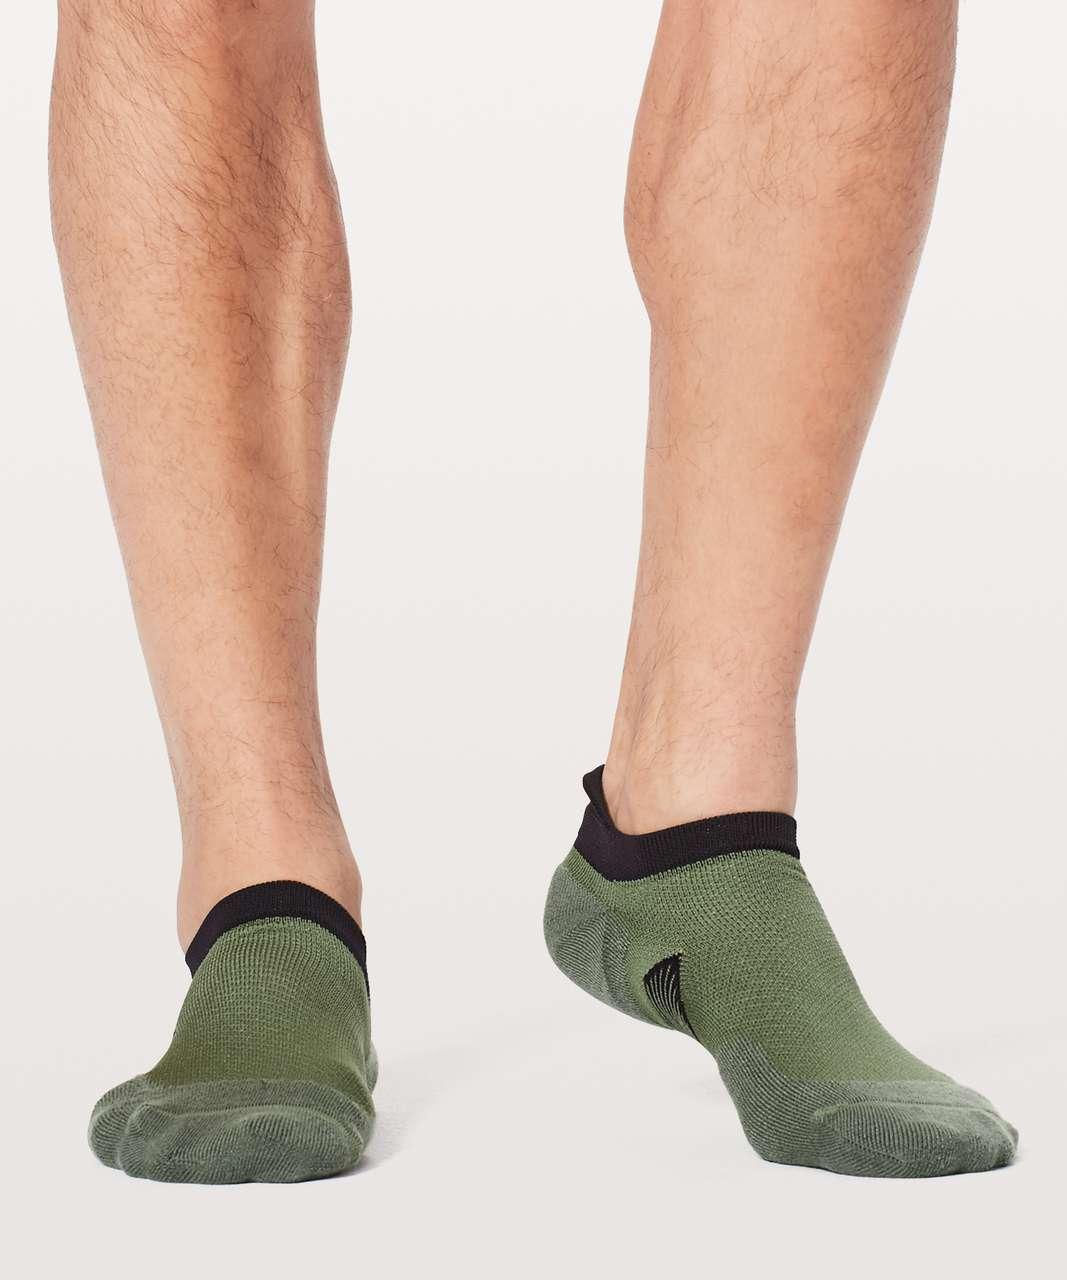 Lululemon T.H.E. Sock *Silver - Green Twill / Black